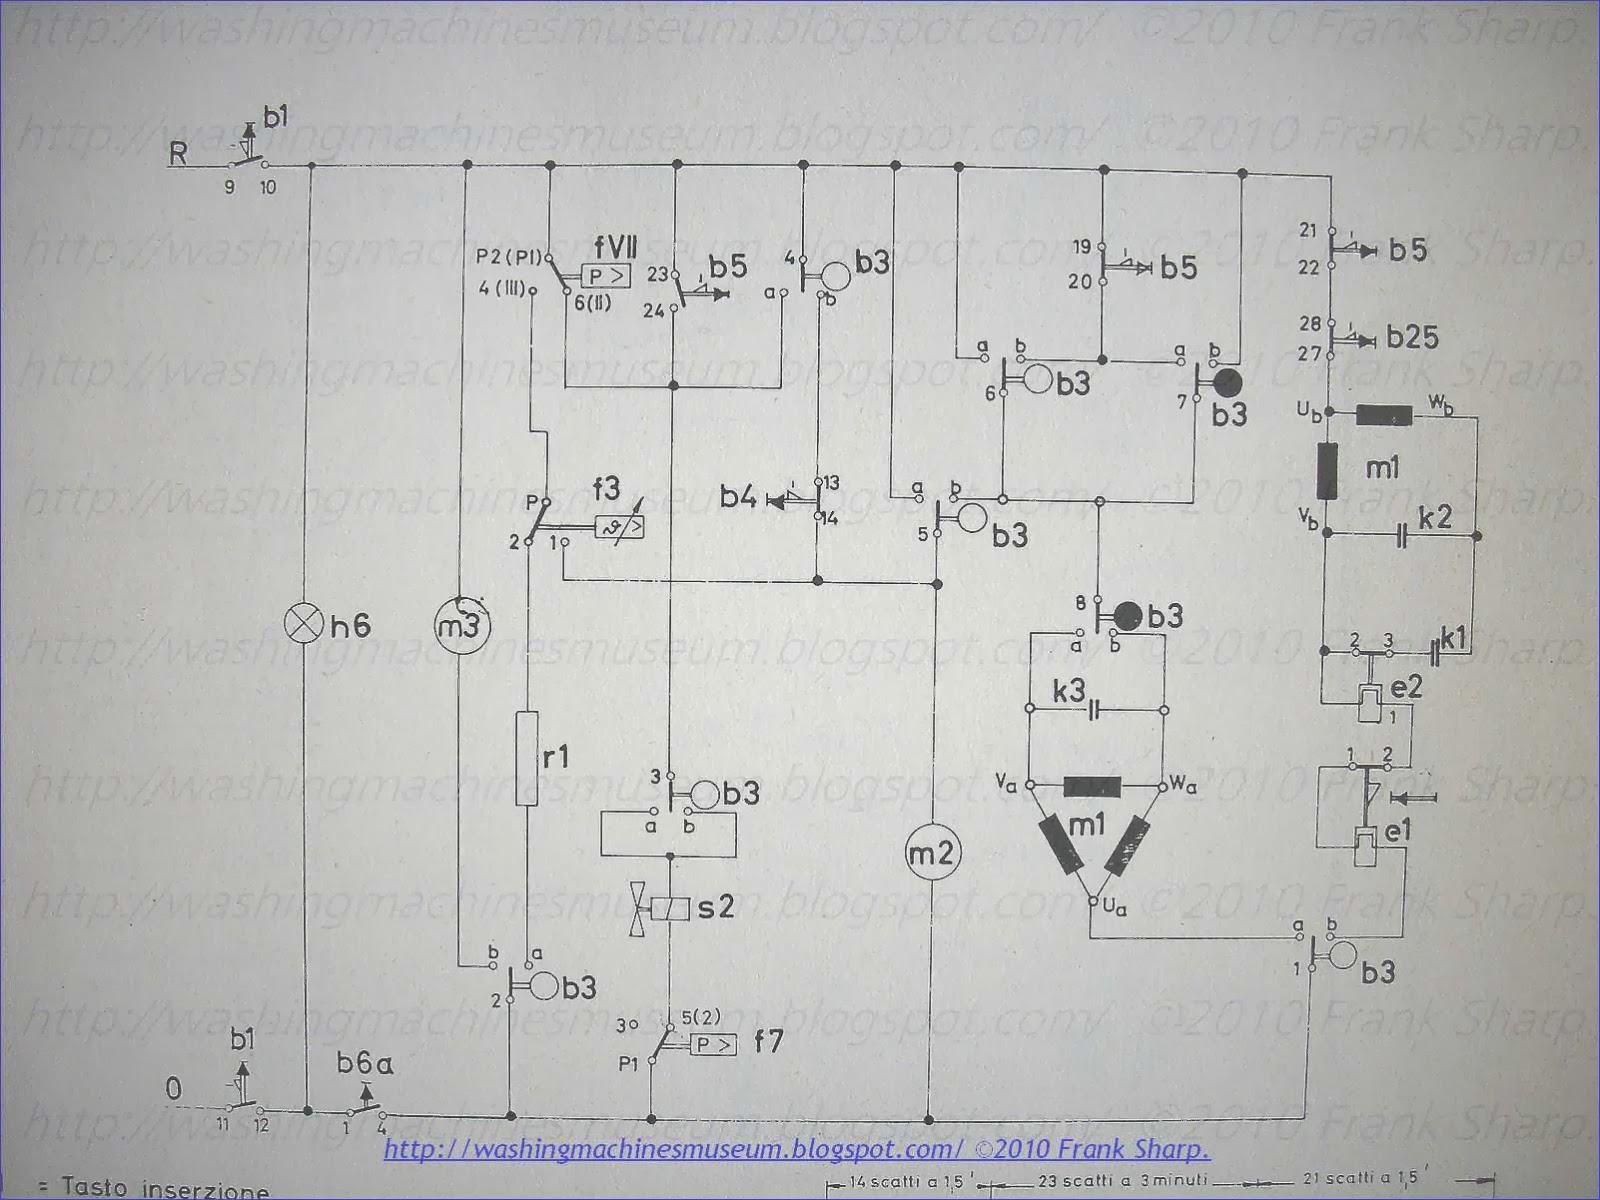 Washing Machine Wiring Breaker Diagram And Schematics Together With